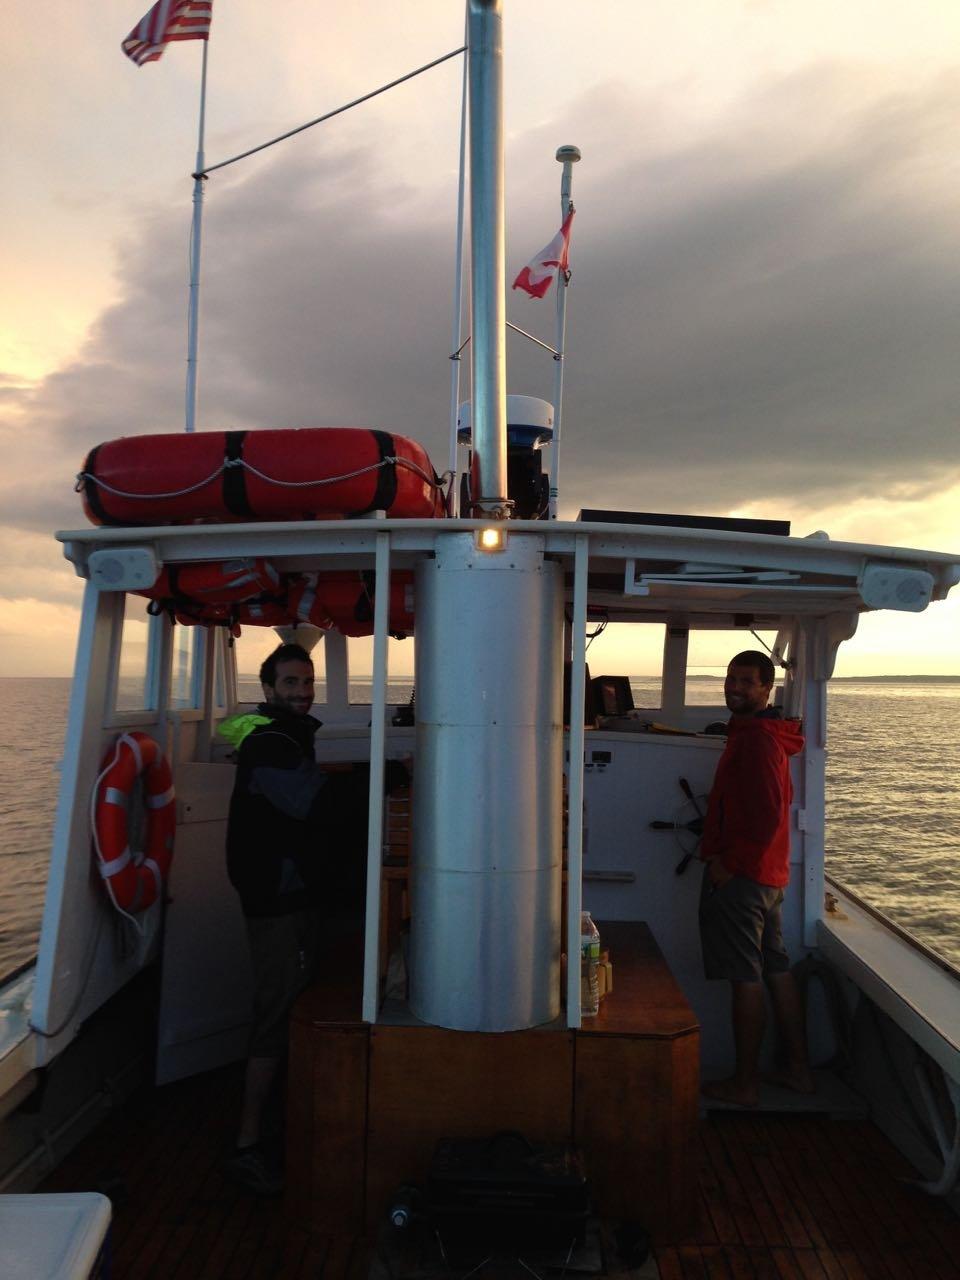 Heading home at sunset aboard M/V MONHEGAN